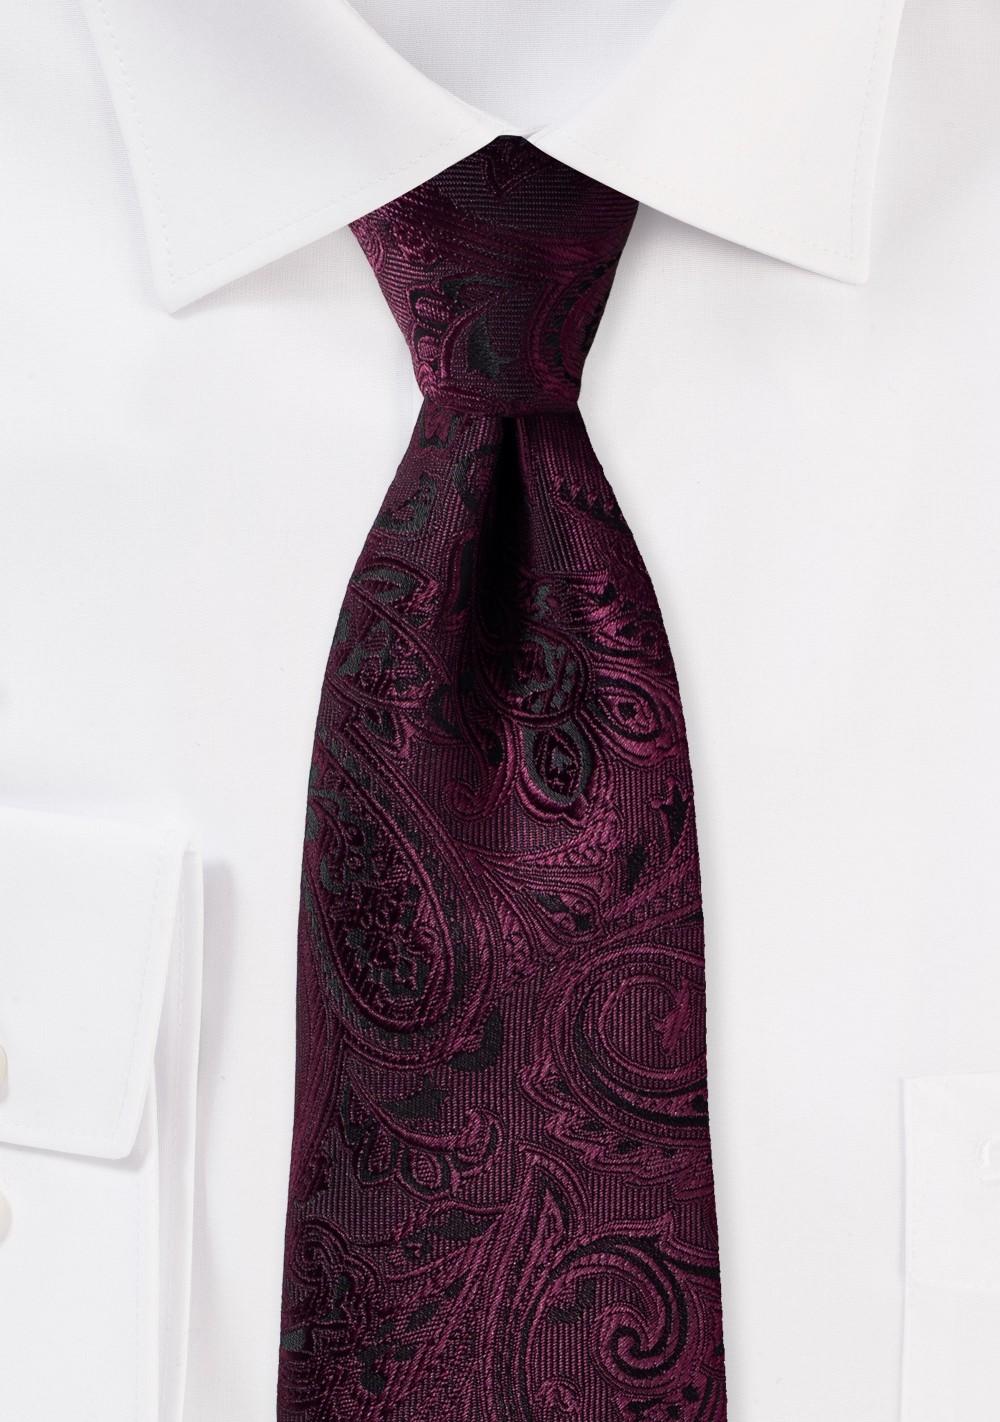 Claret Paisley Tie in XL